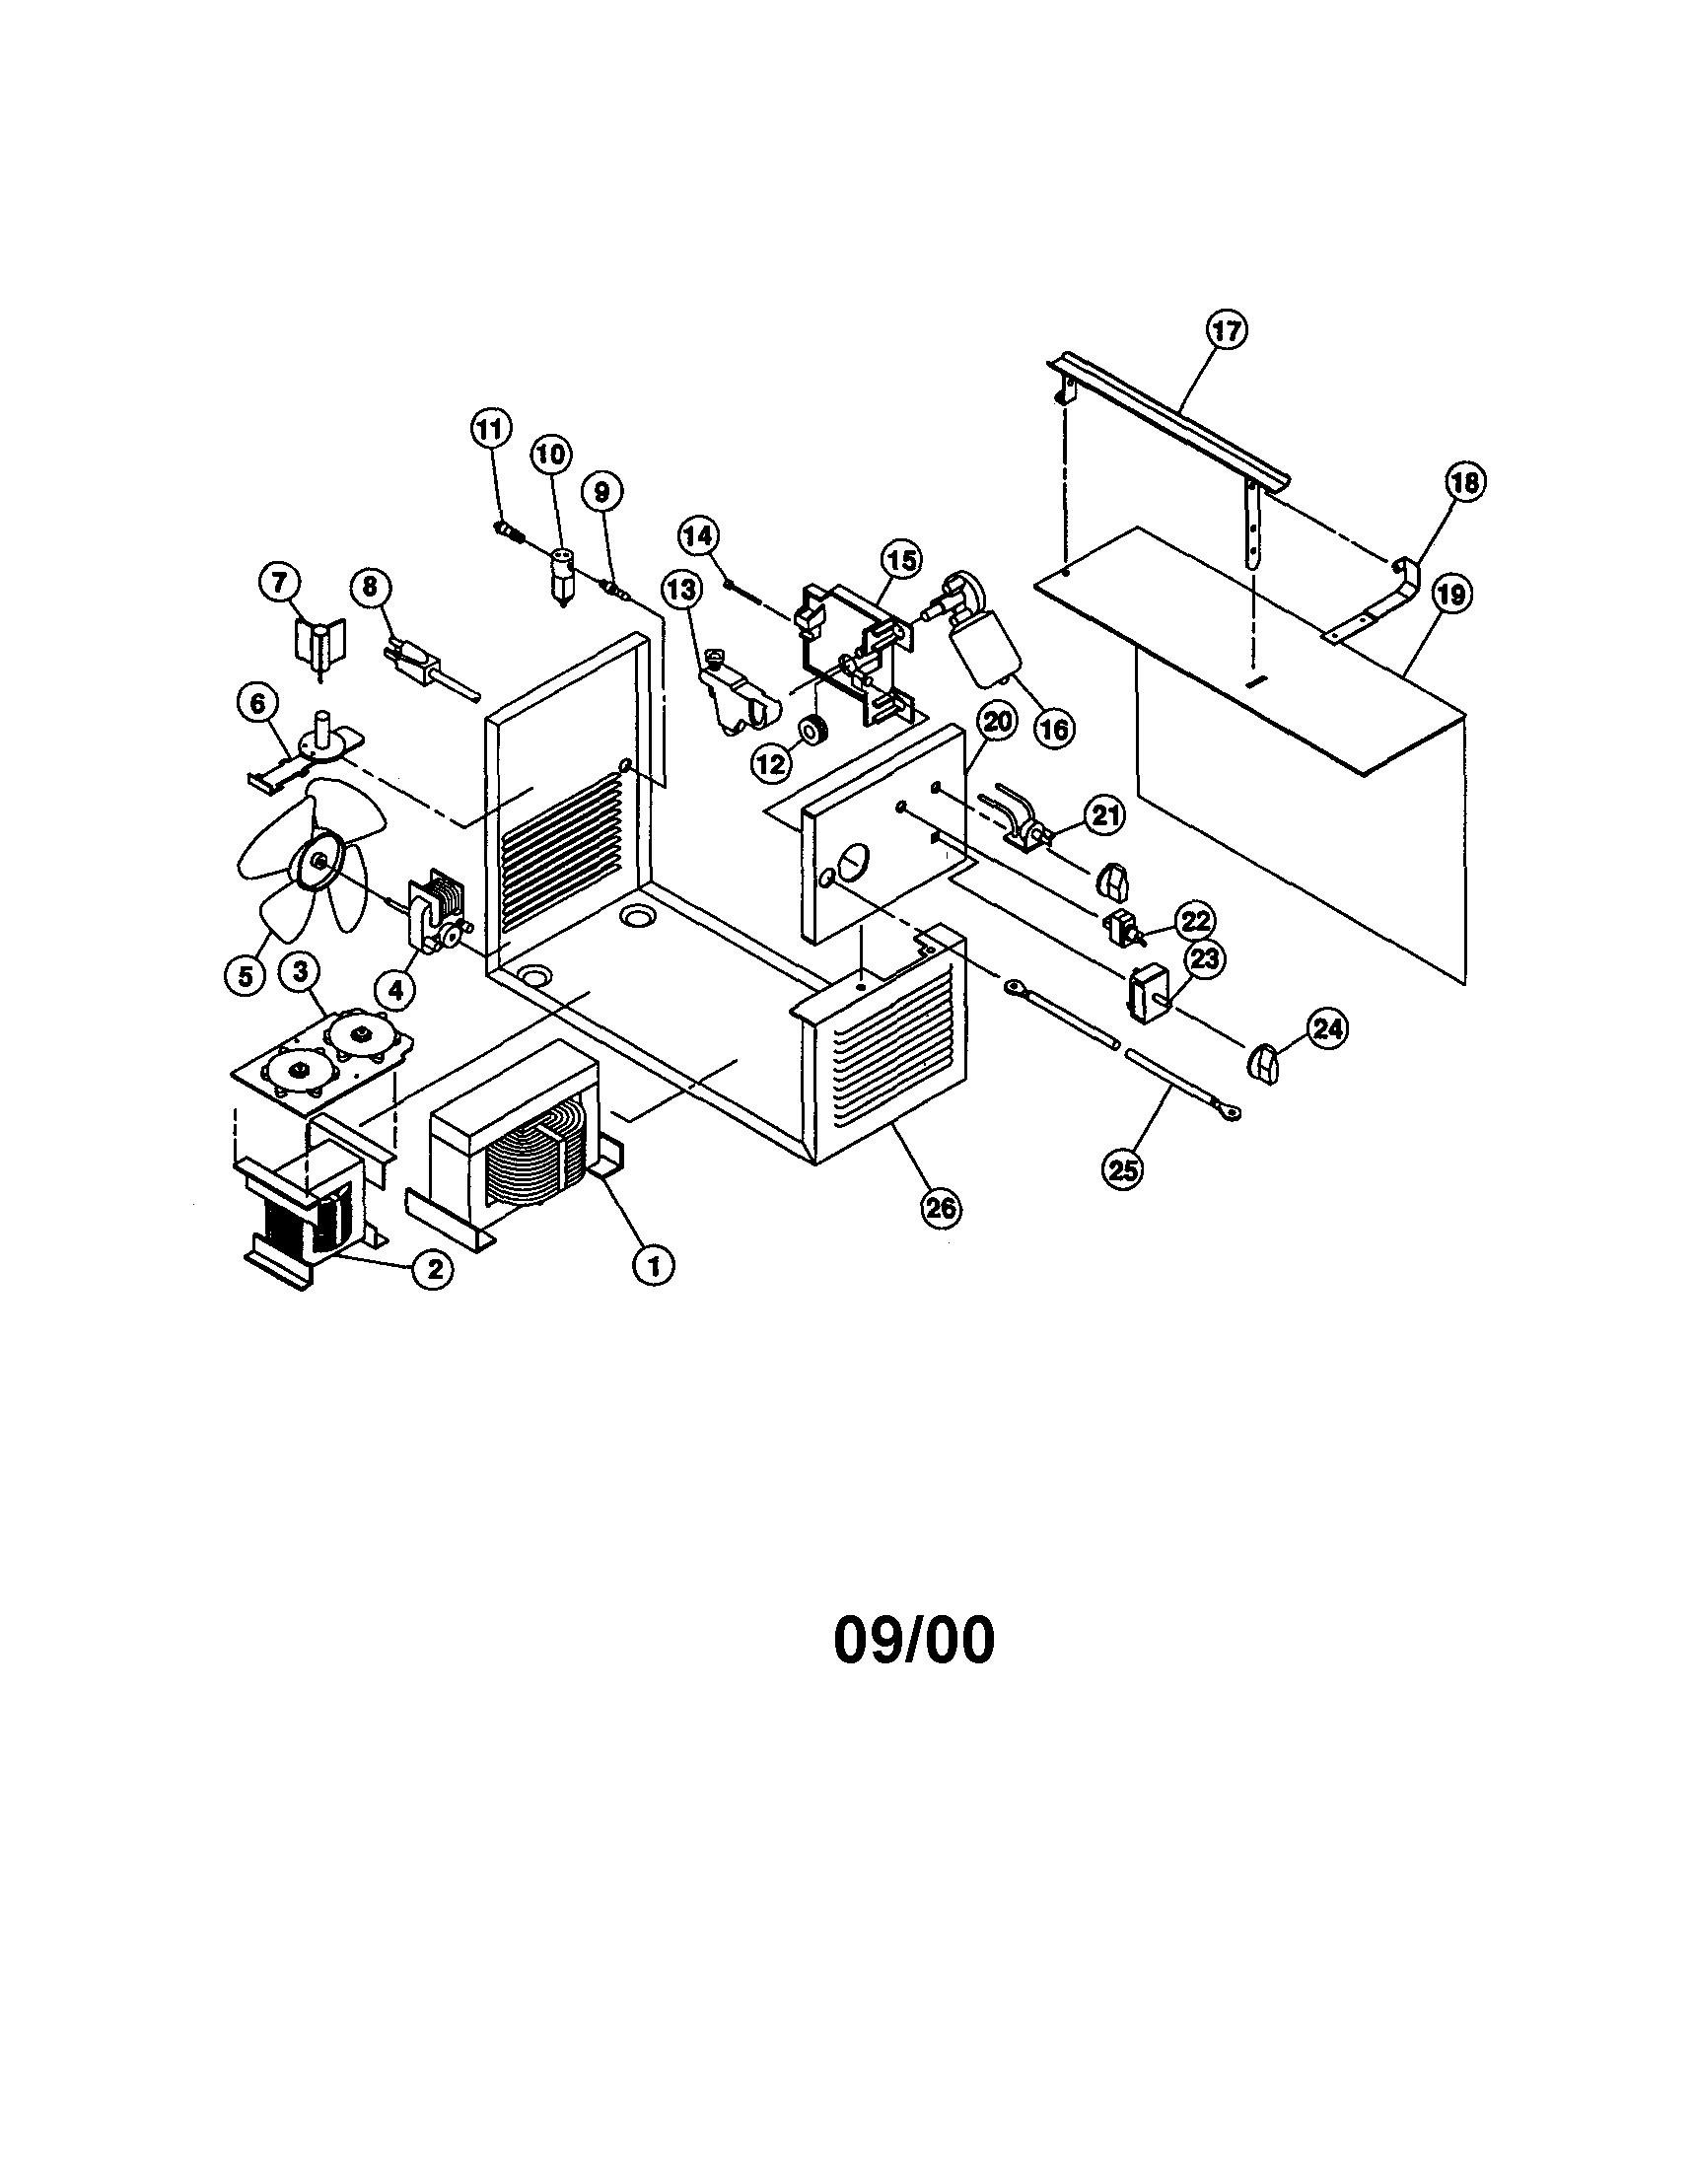 2003 Saturn Vue Fuse Box Diagram On Ford Festiva Wiring Diagram 1993